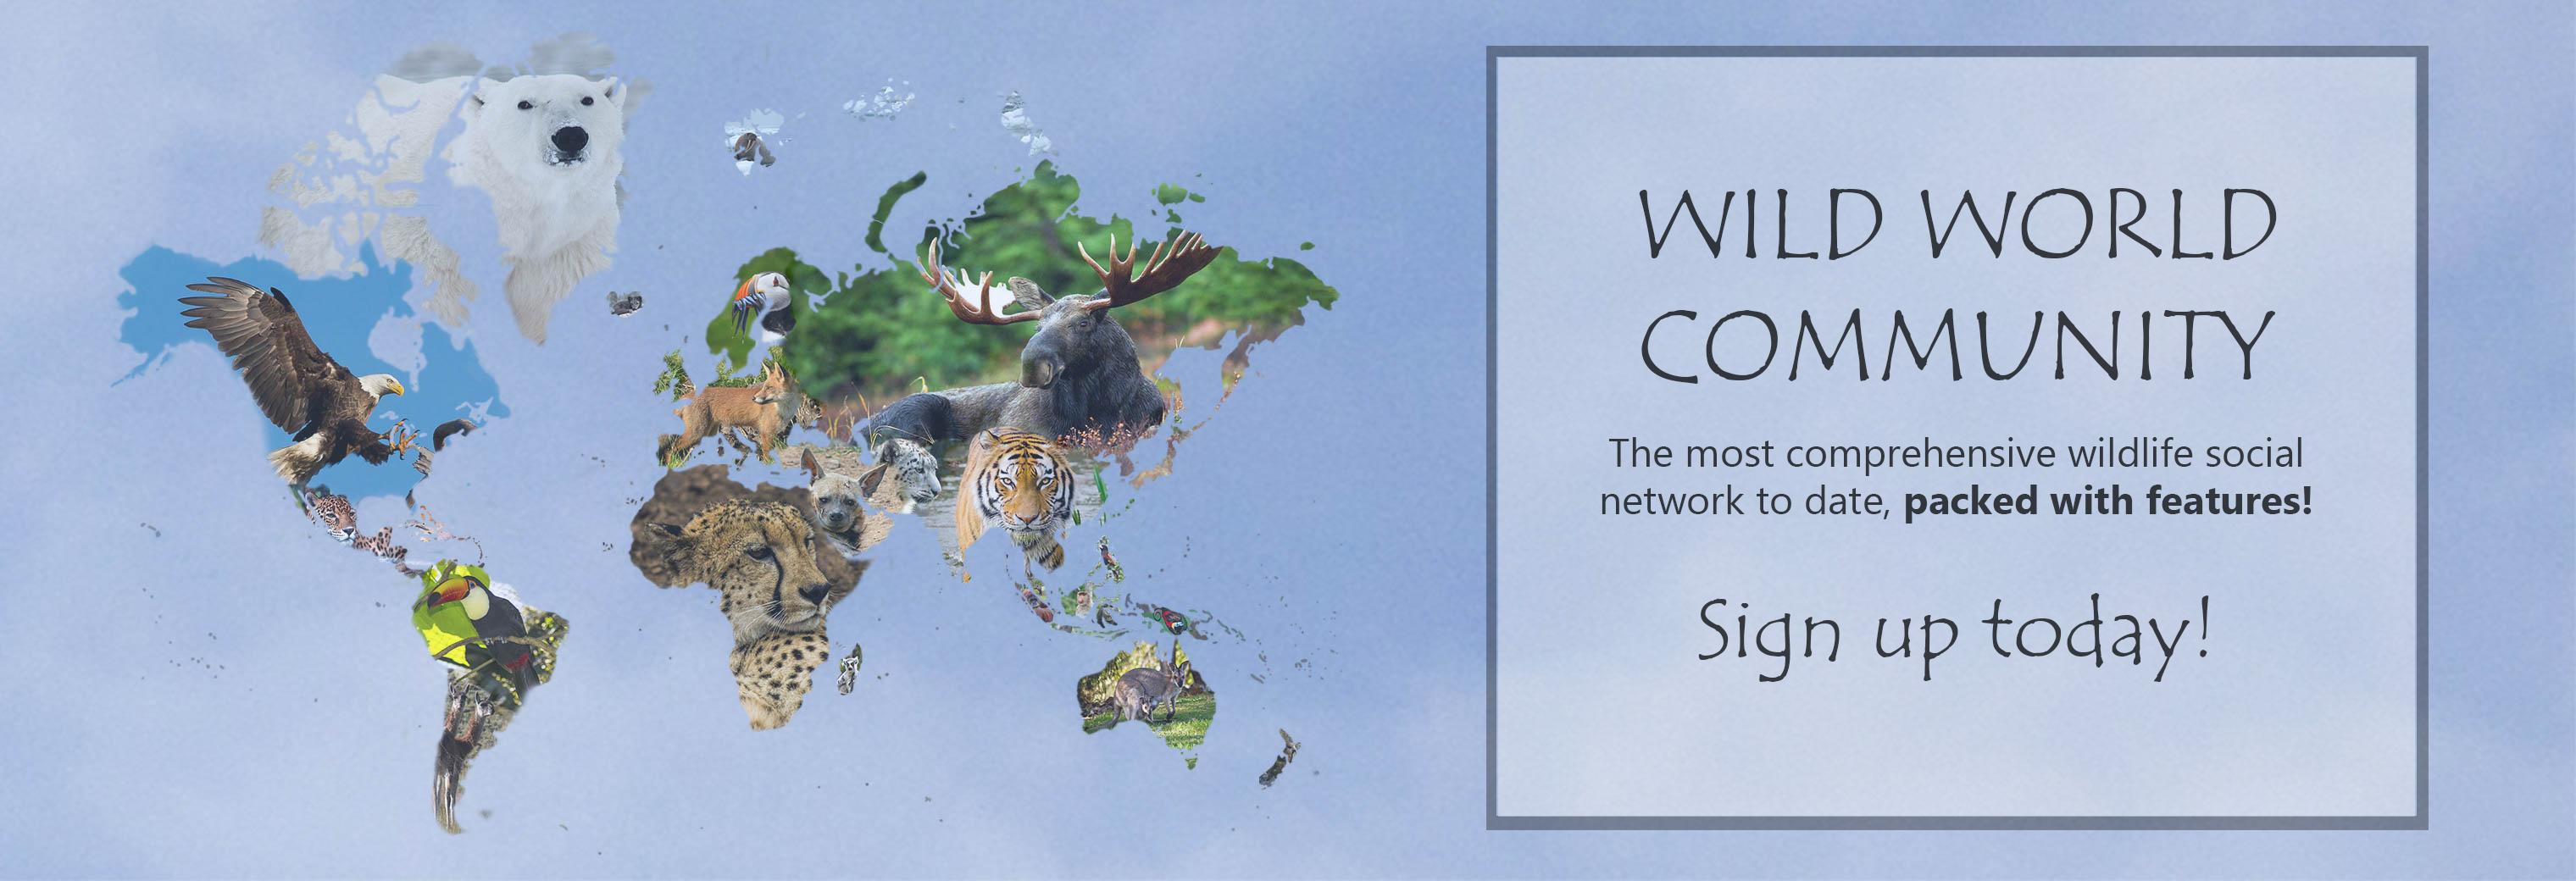 Wild World Community 40825707594_3fa7642cb2_o_d The Wildlife Social Network